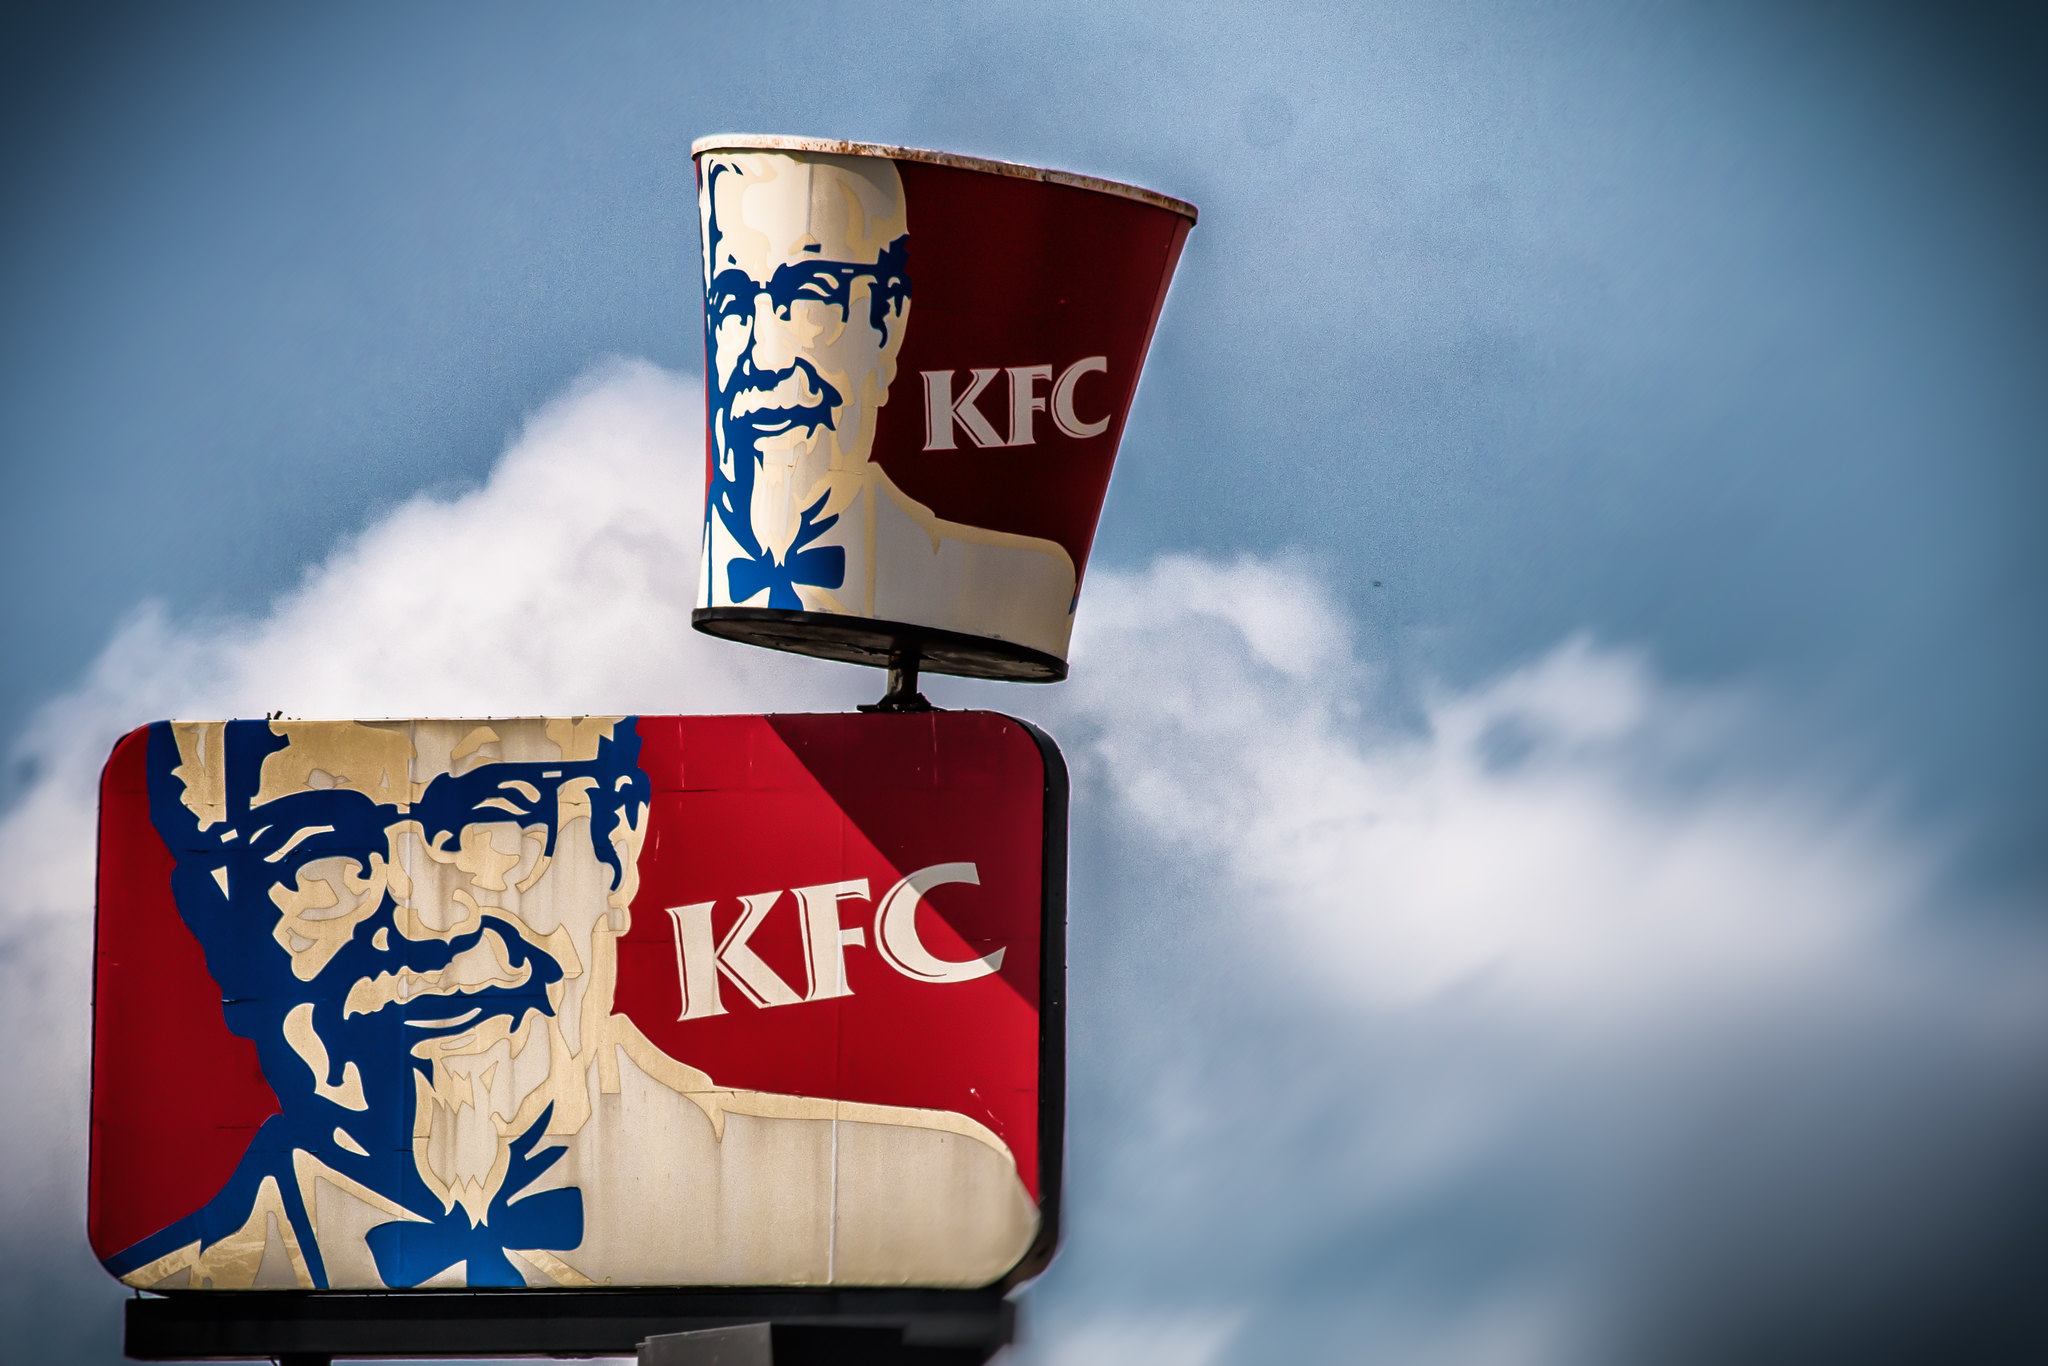 KFC logo and bucket